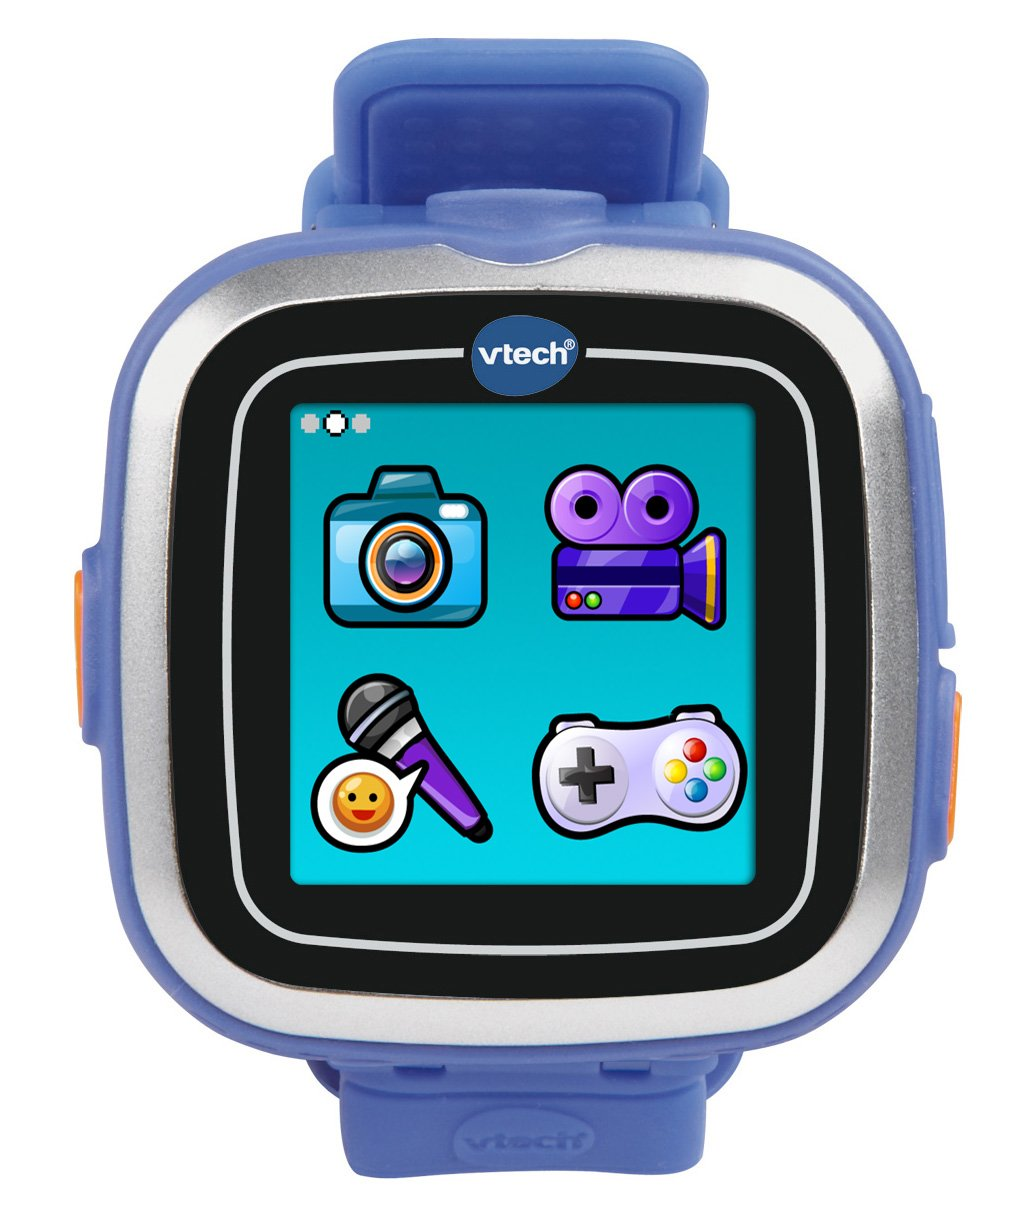 VTech Kidizoom Smartwatch, Blue (Discontinued by manufacturer) by VTech Kidizoom (Image #3)